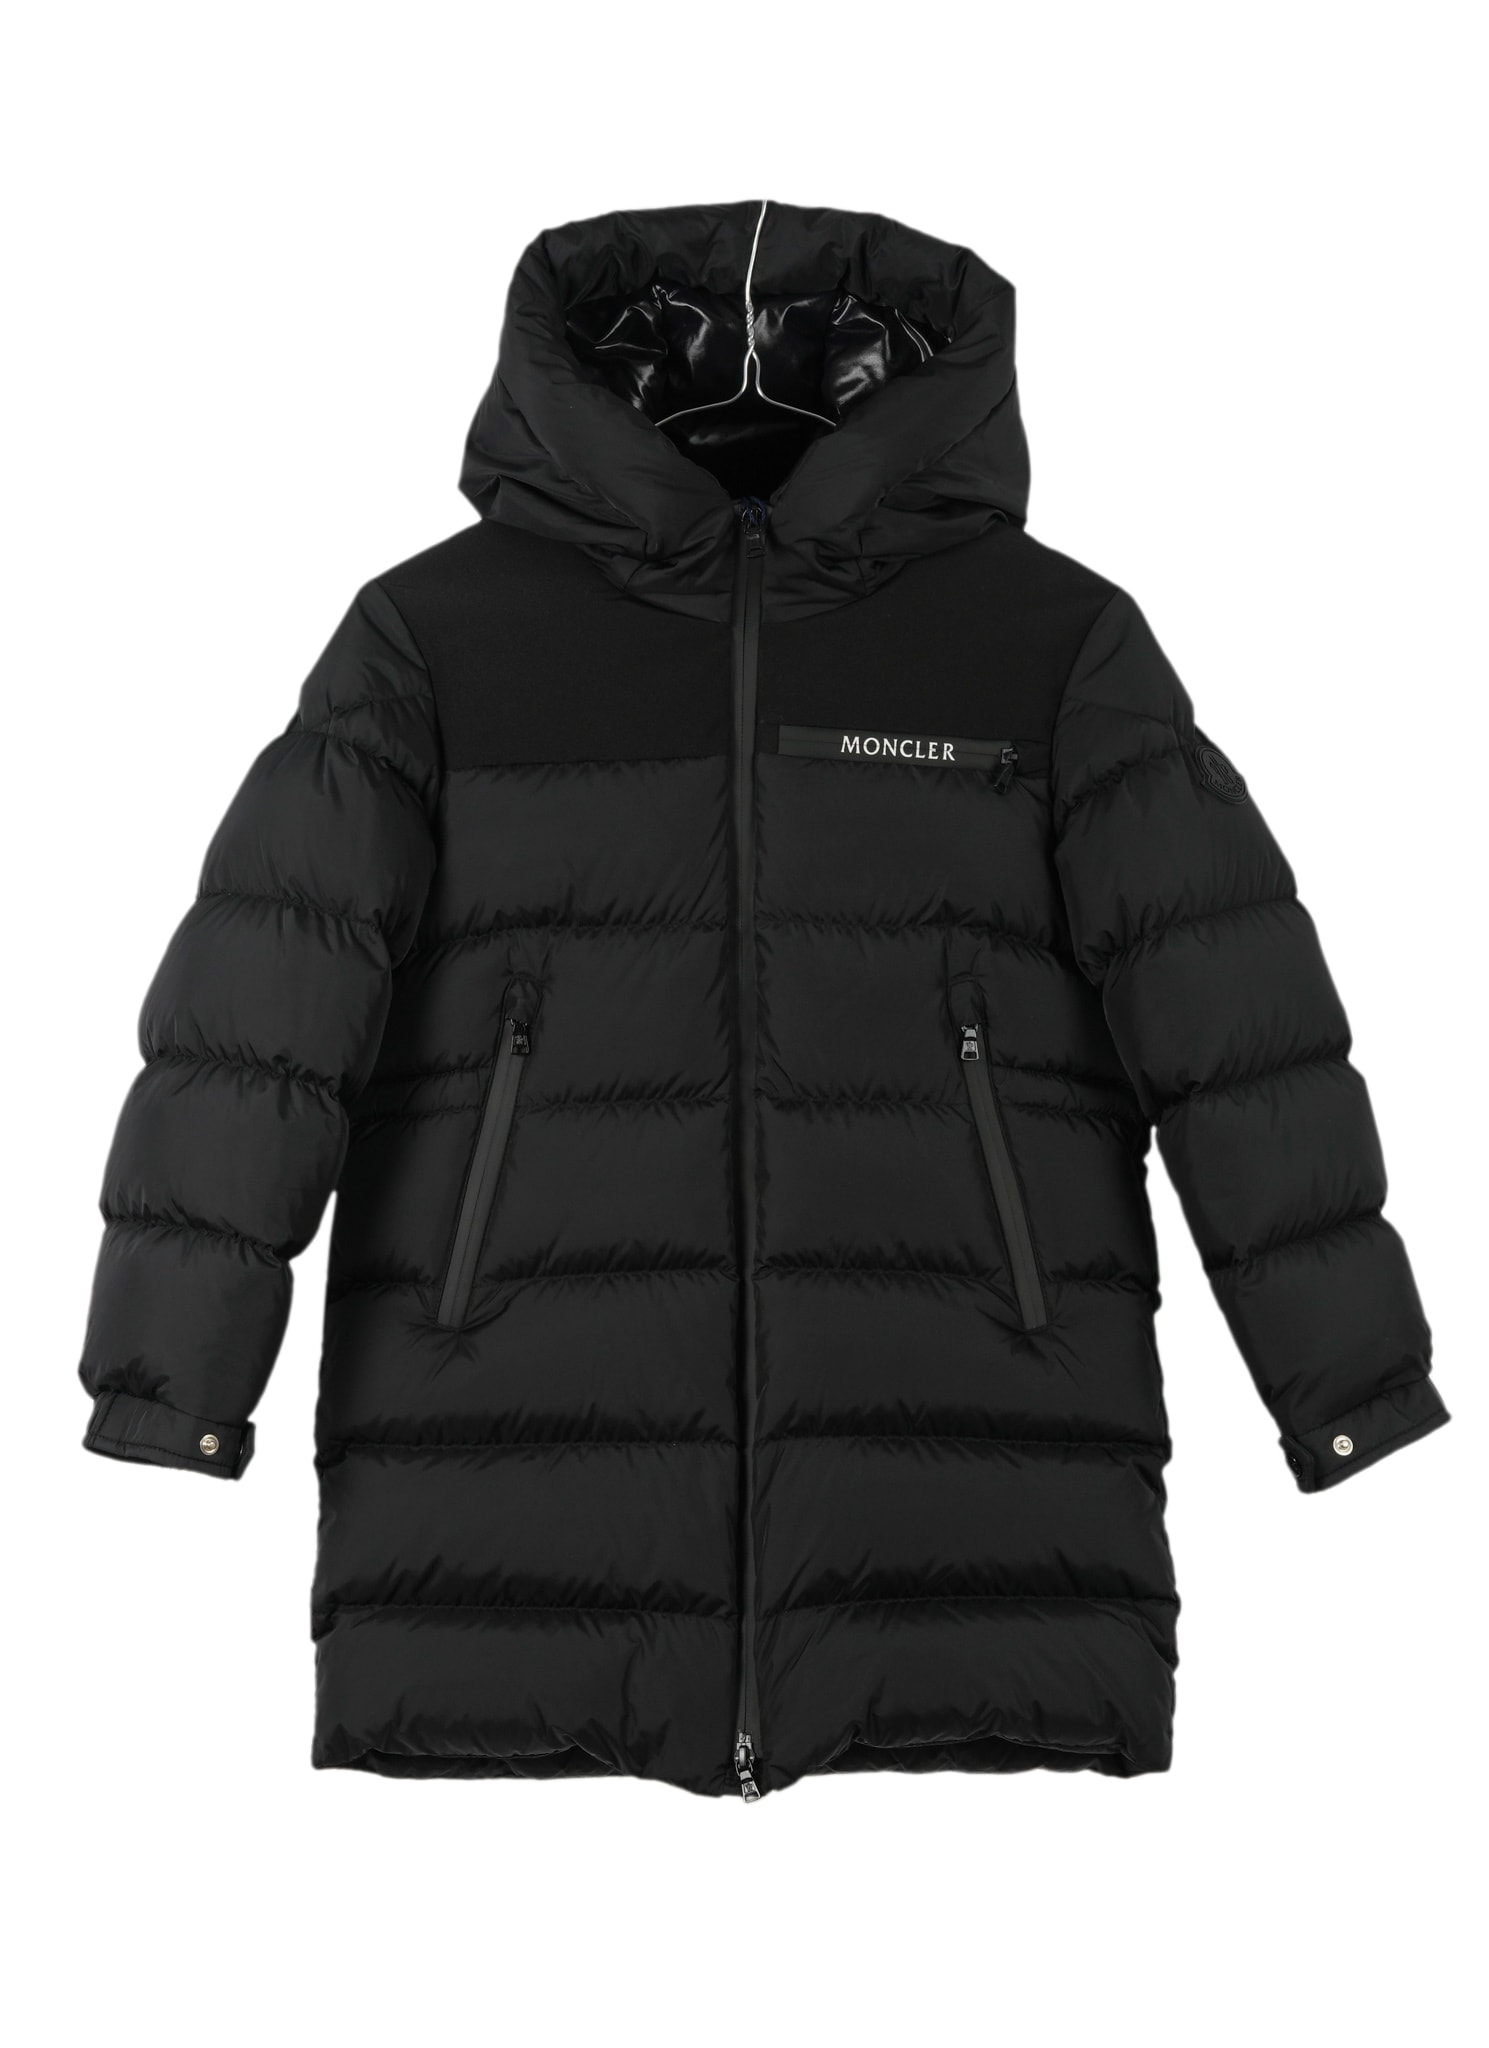 Moncler Nuray Jacket